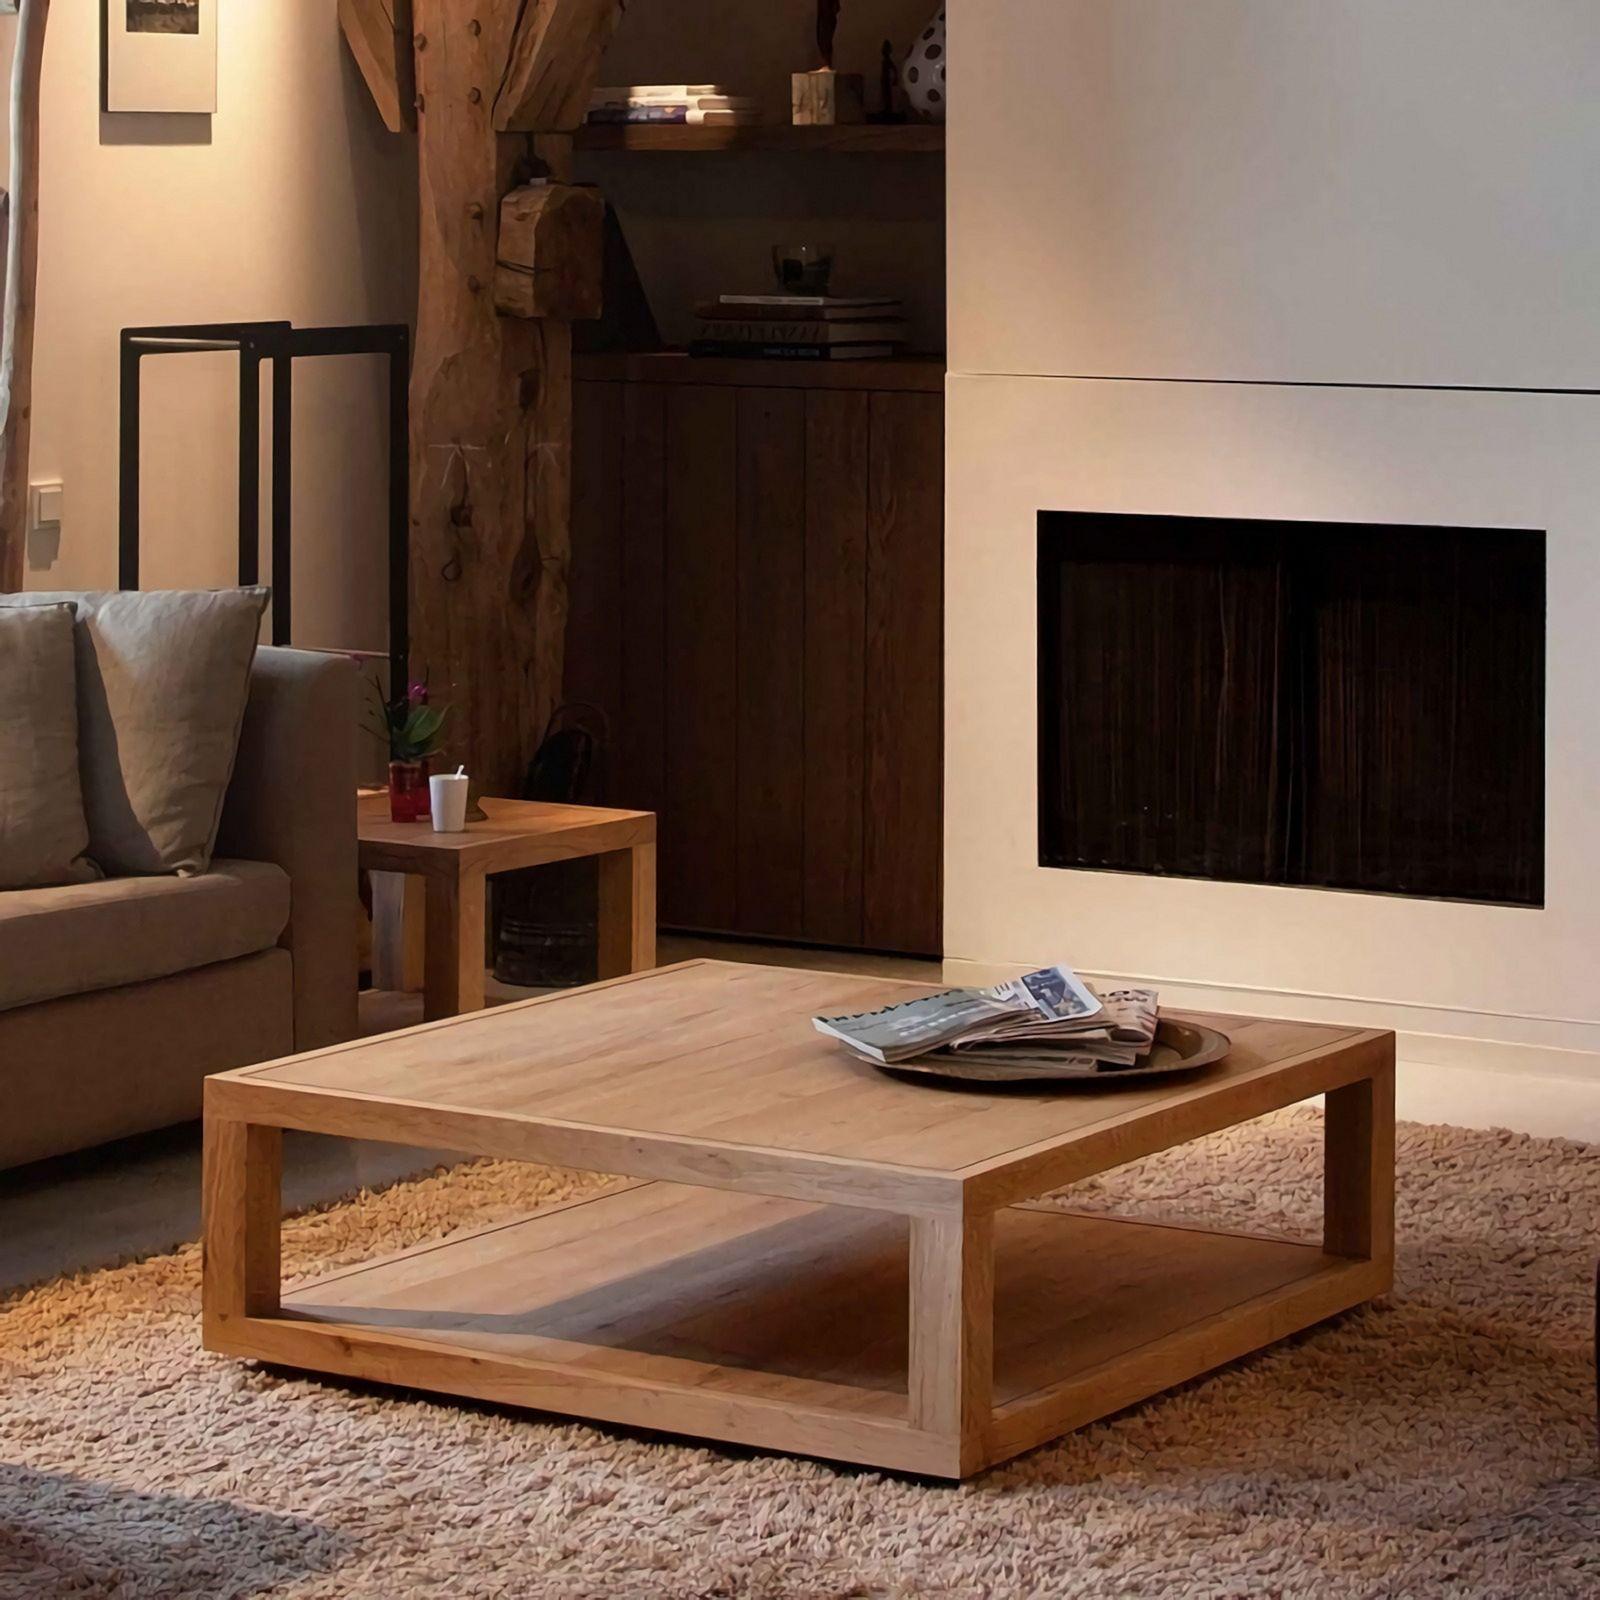 Best 20 Simple Wooden Furniture For Rustic Living Room Ideas Https Dsgndcr Com Home Inter Wooden Living Room Square Living Room Table Furniture Design Wooden [ 1600 x 1600 Pixel ]